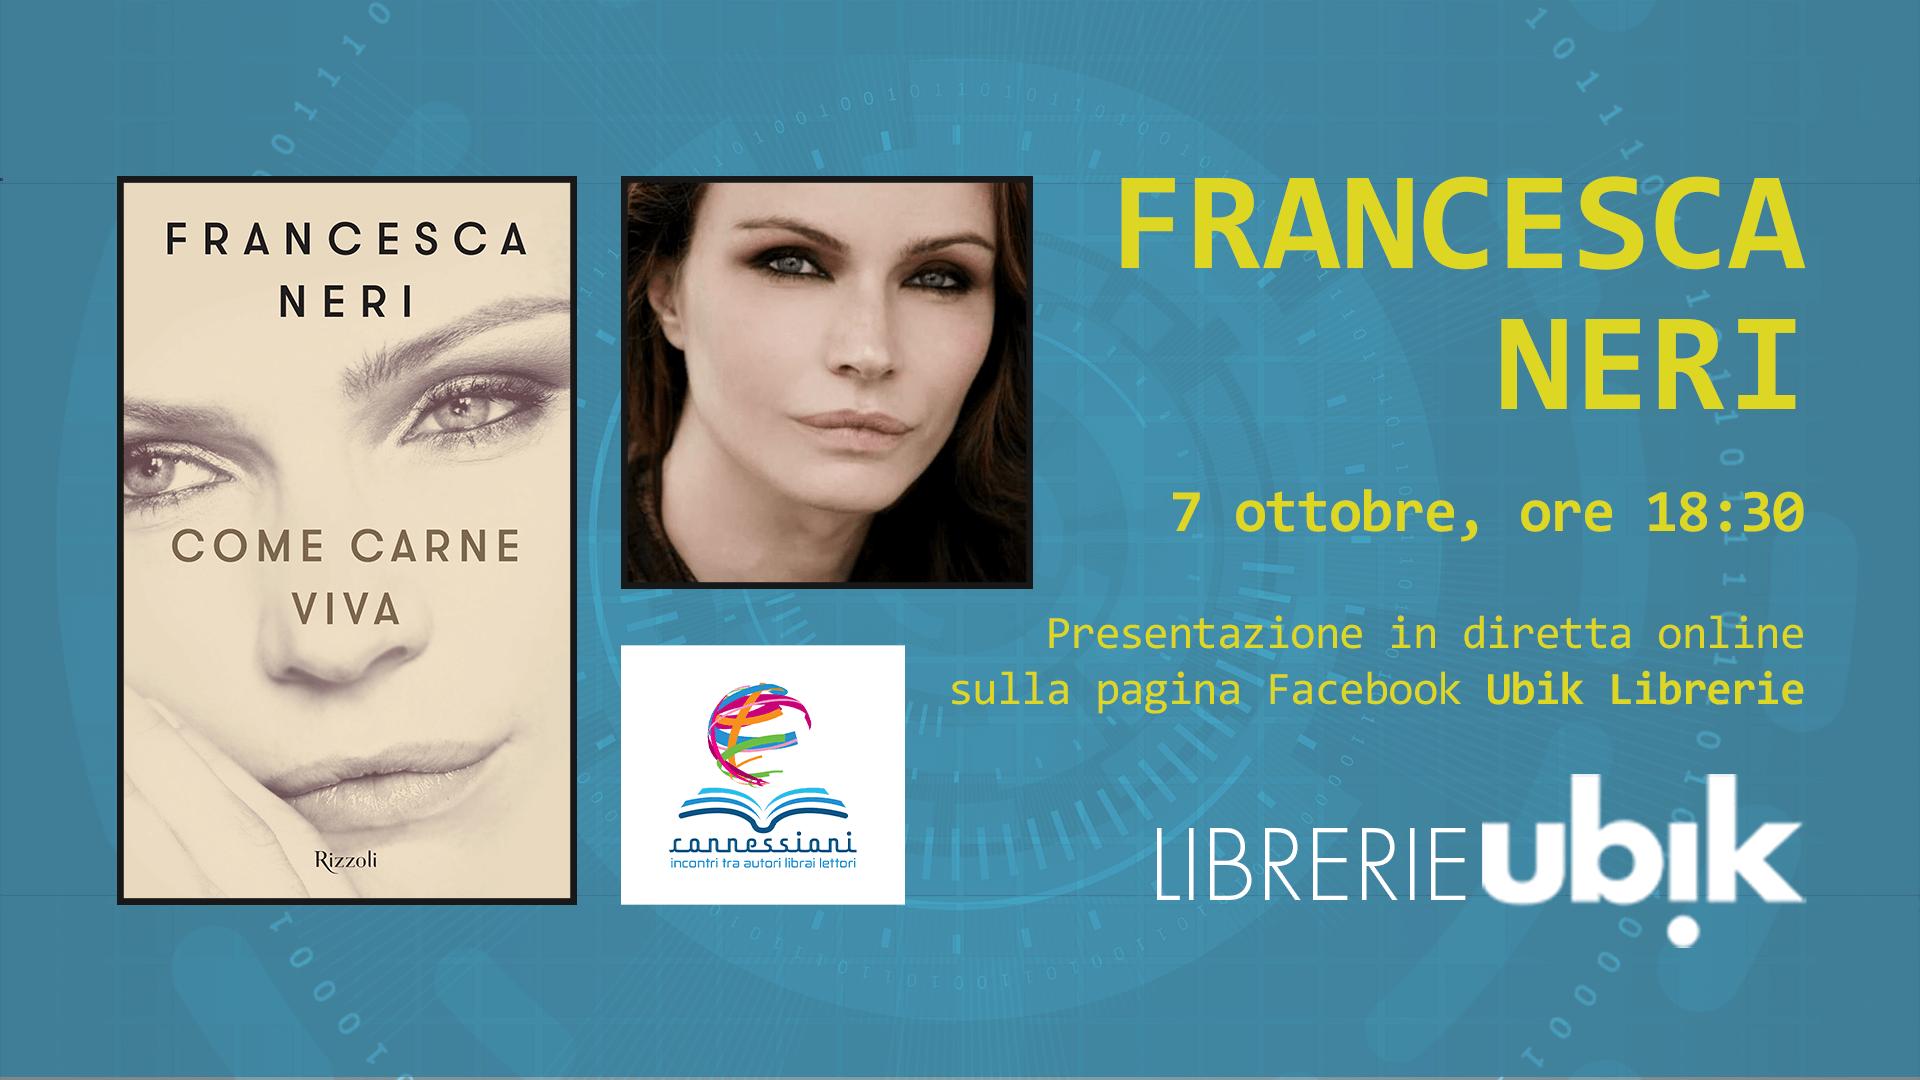 FRANCESCA NERI presenta